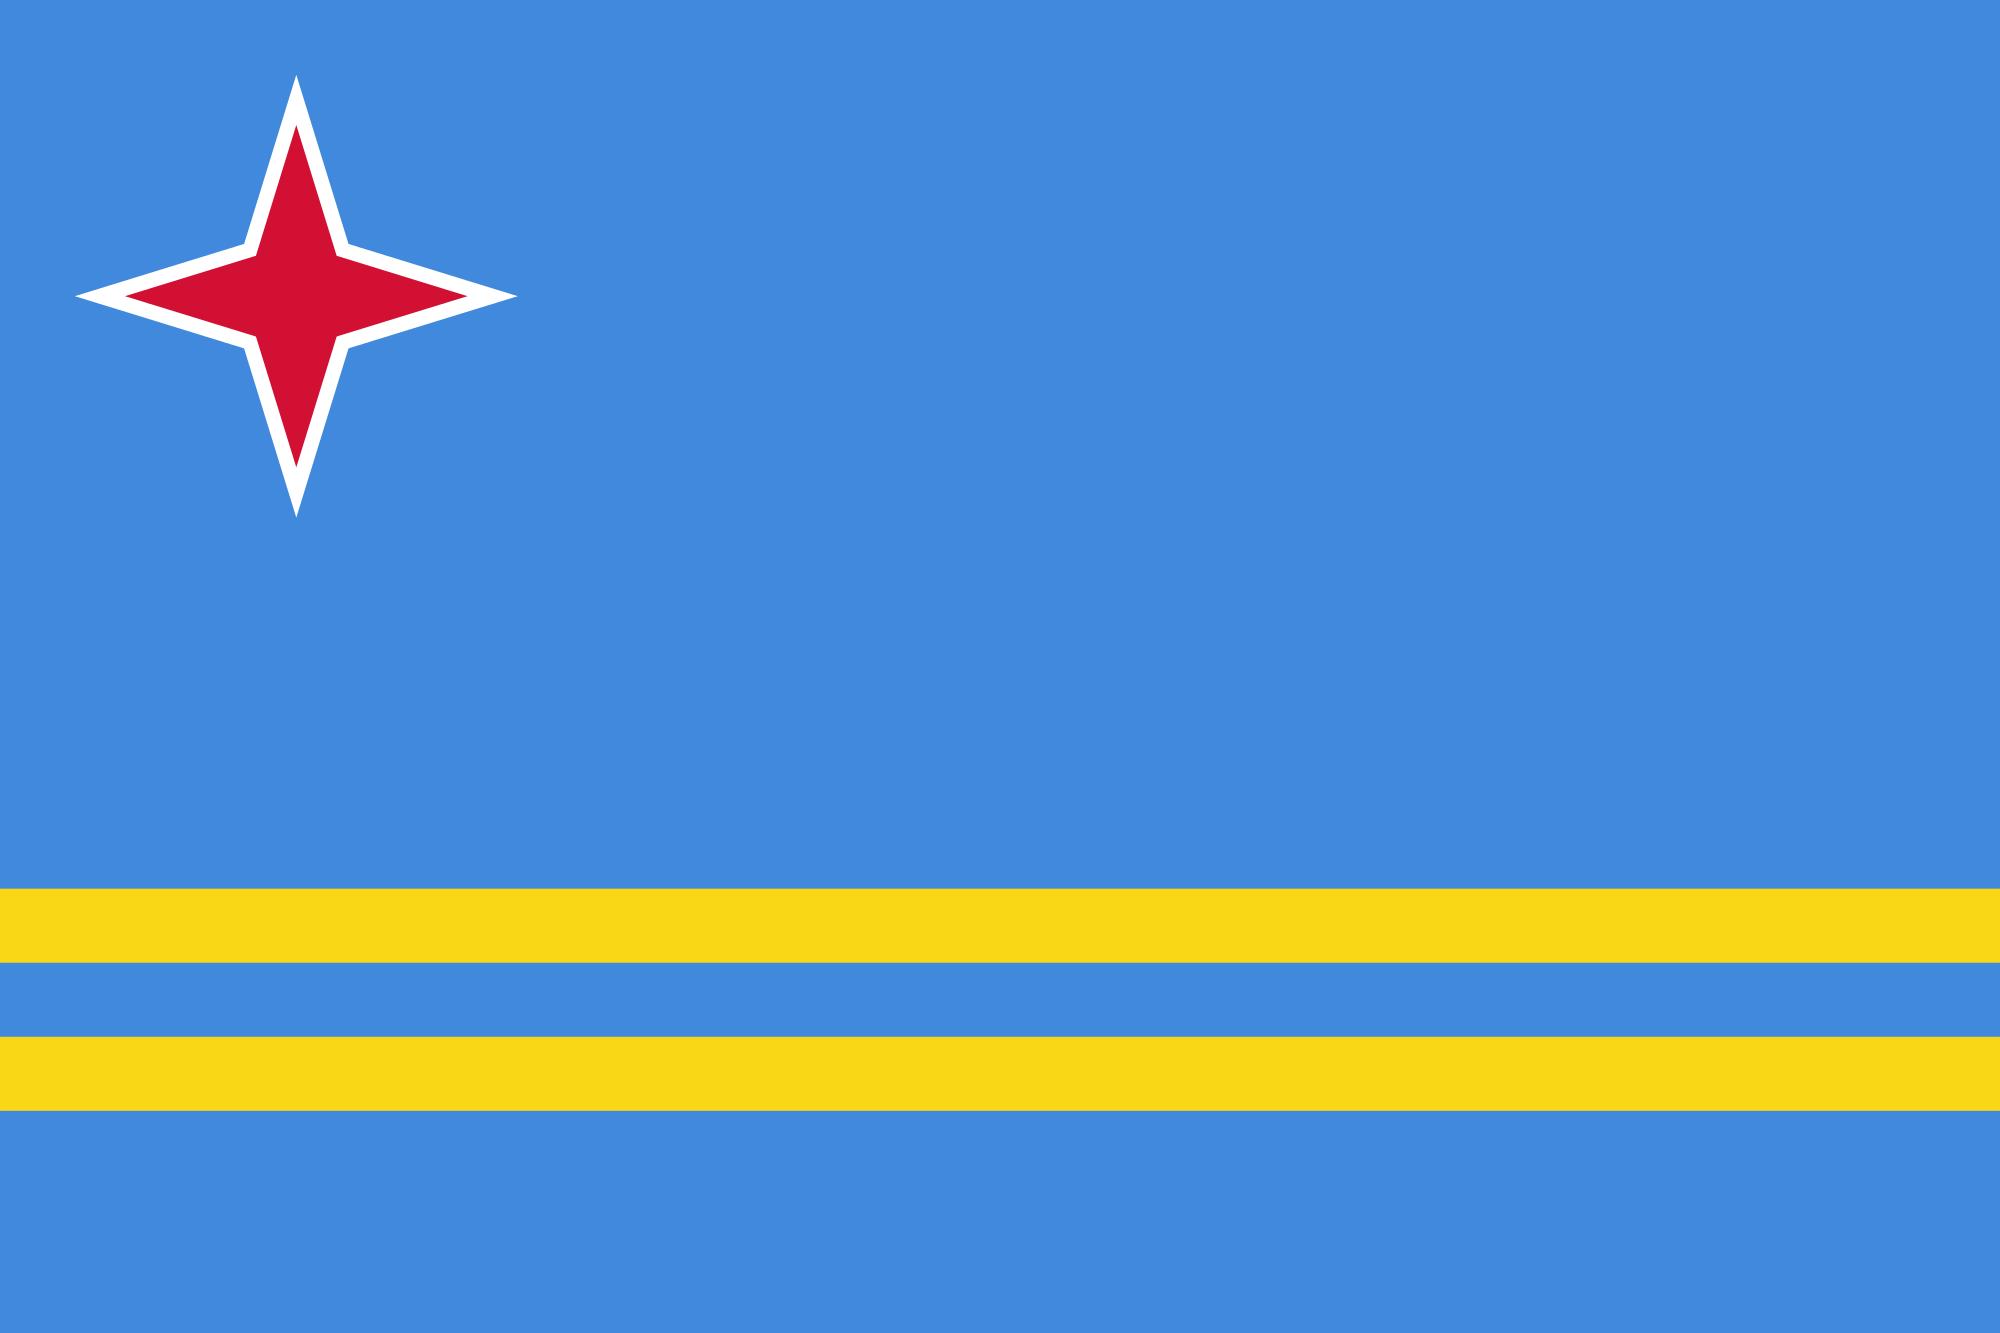 Aruba, paese, emblema, logo, simbolo - Sfondi HD - Professor-falken.com